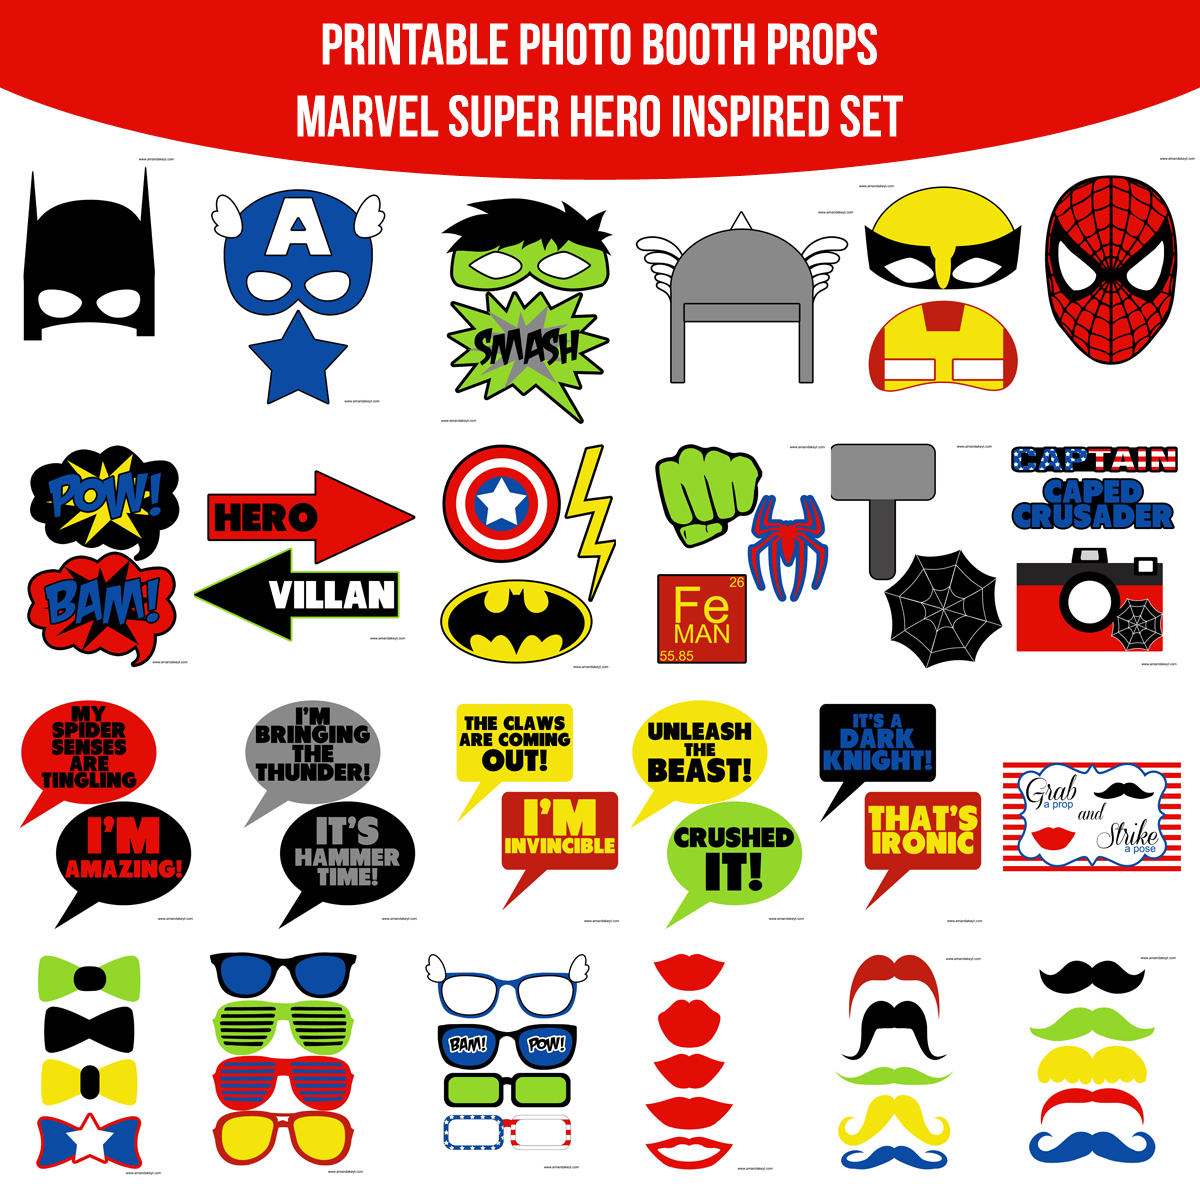 photograph about Free Printable Superhero Photo Booth Props titled Publications Videos Tv set Amanda Keyt Printable Plans